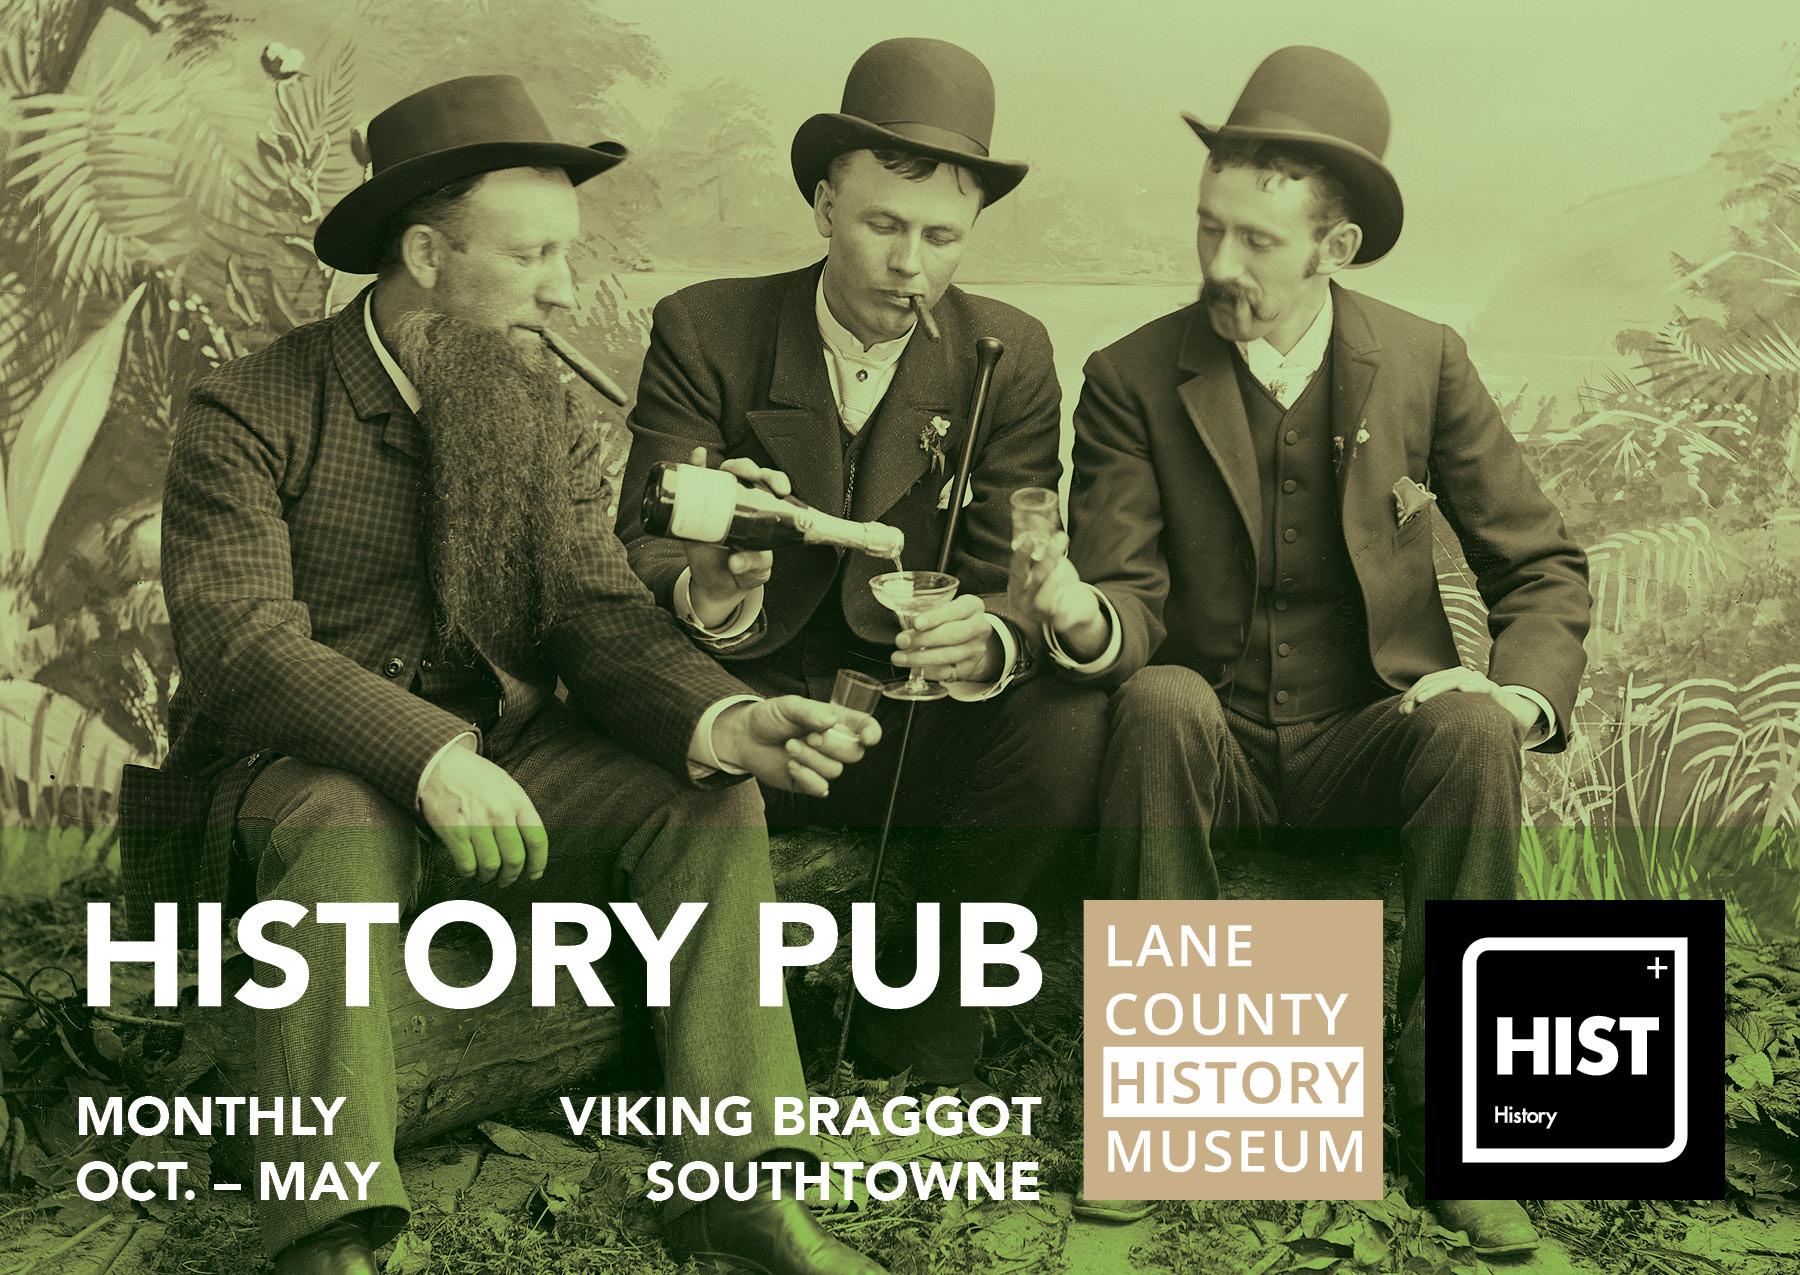 History Pub Monthly Oct-May, Viking Braggot Southtown